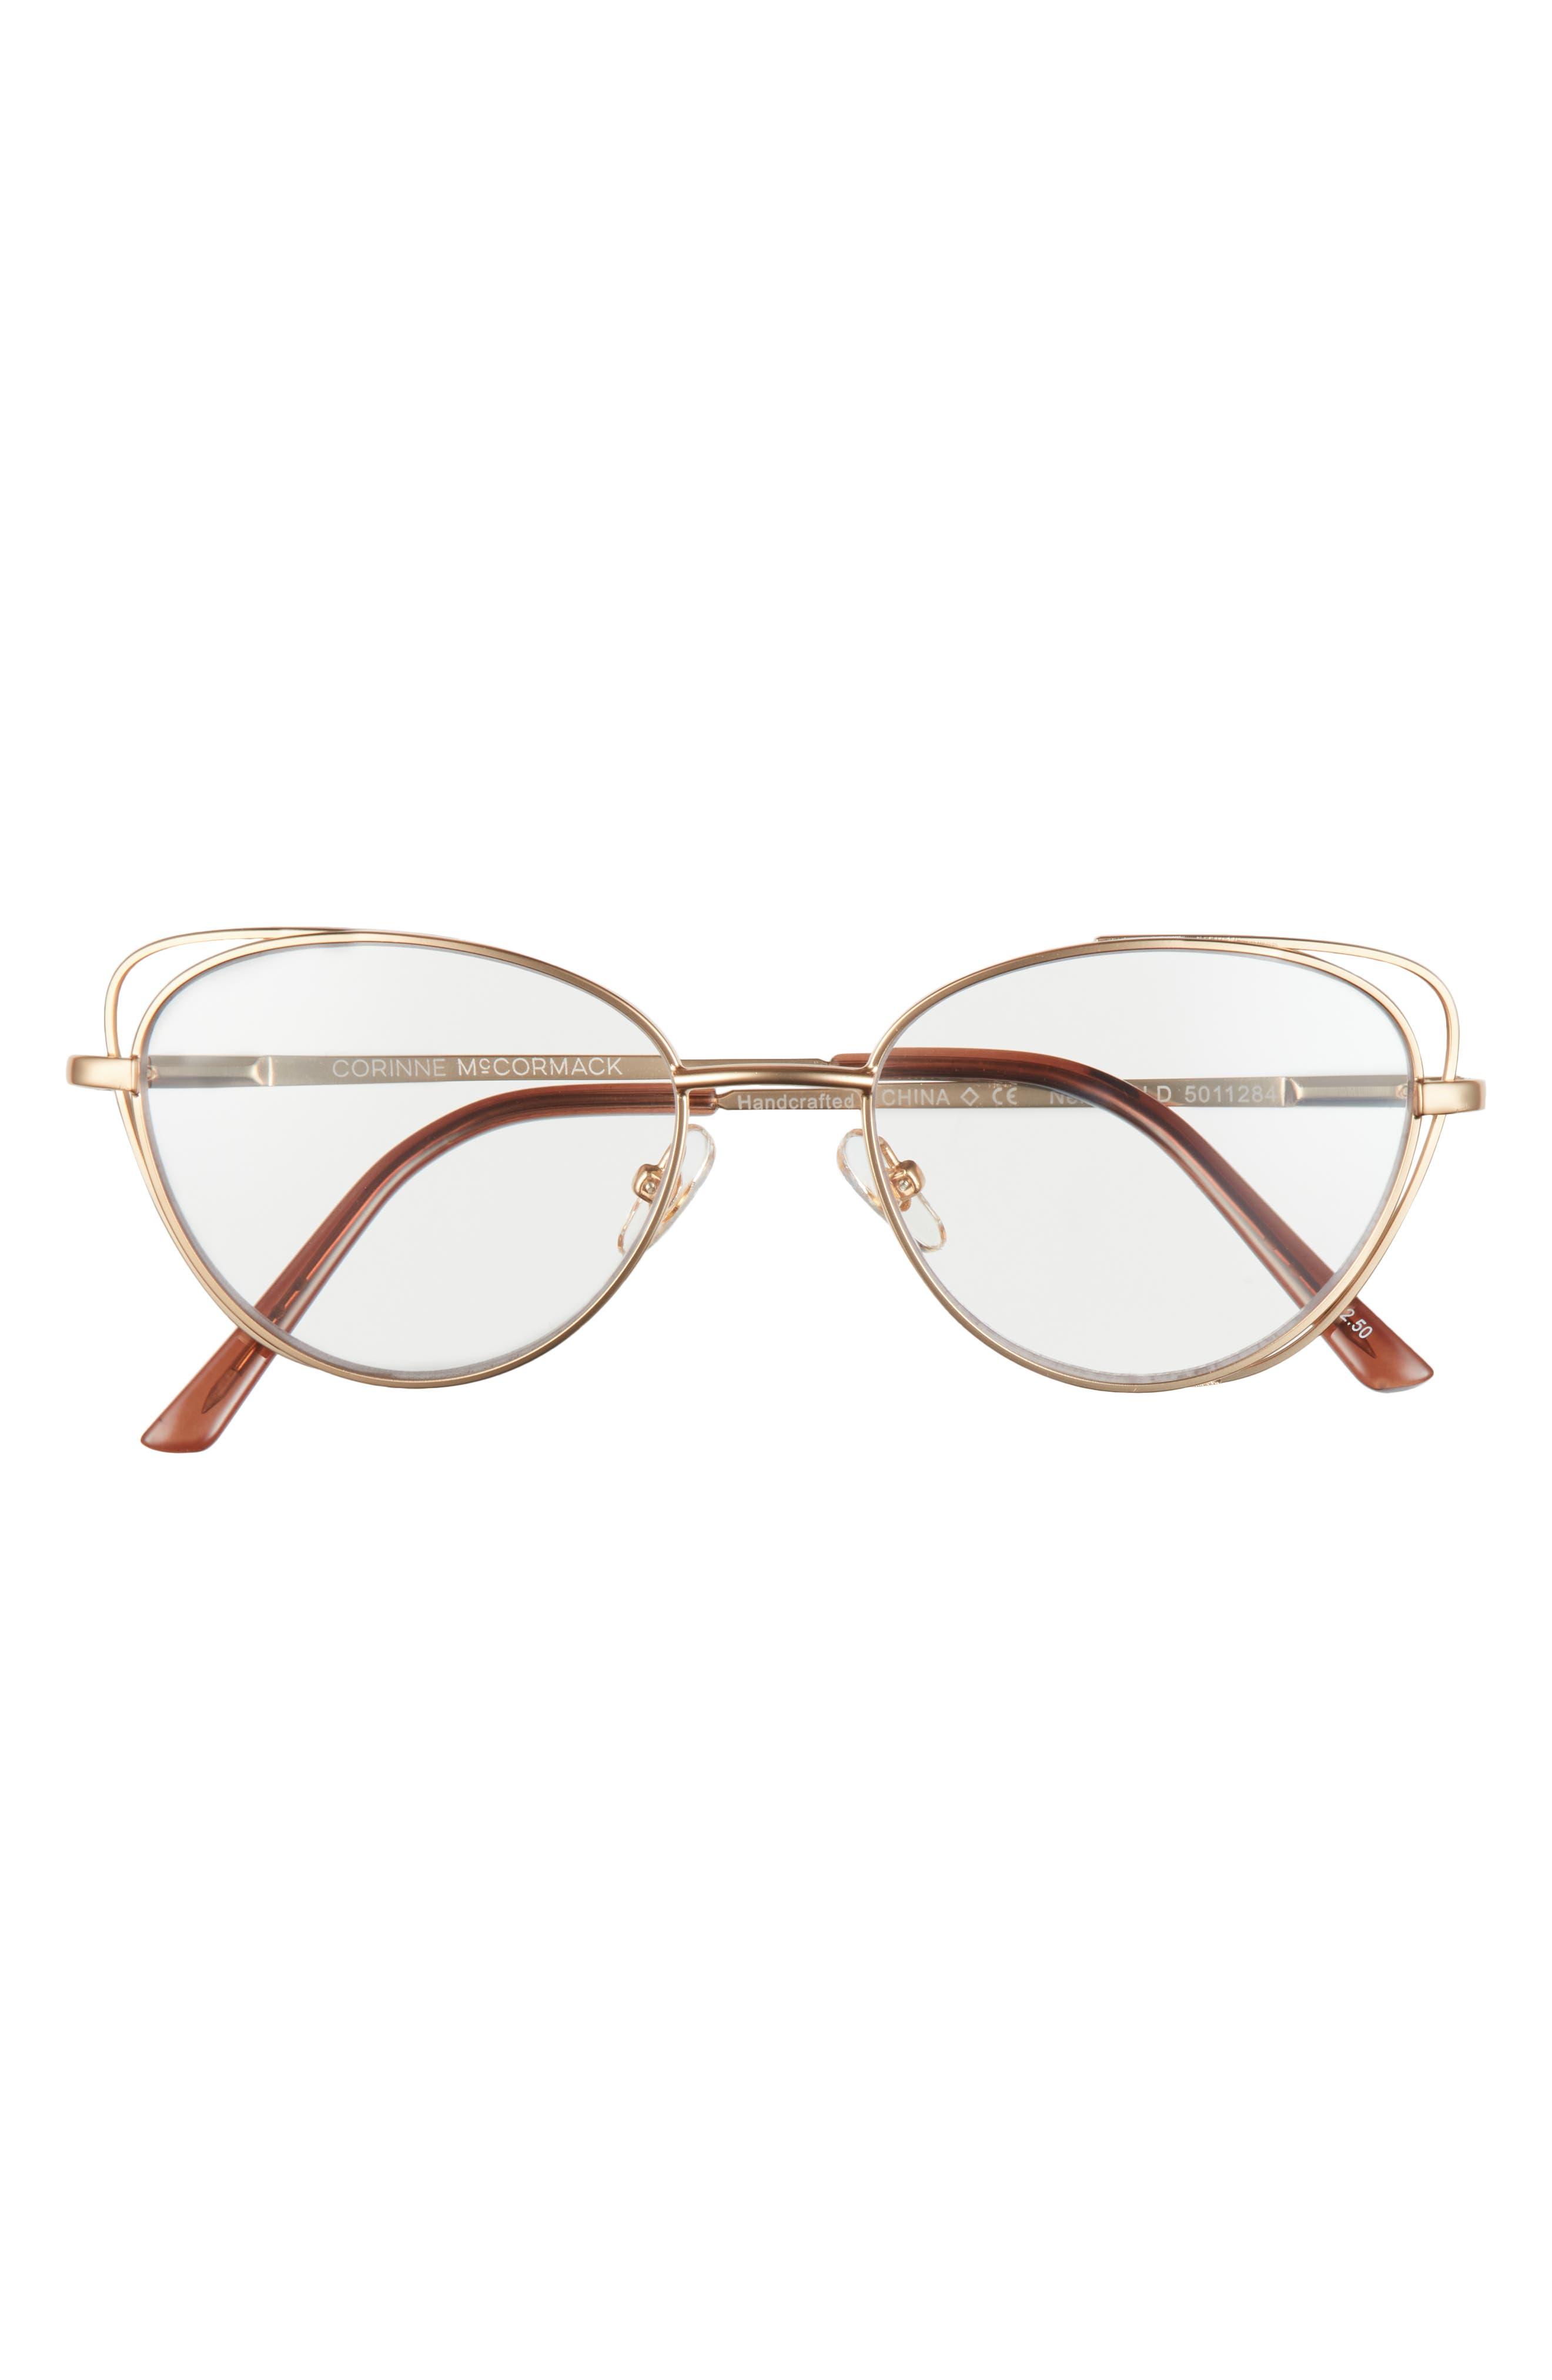 Nema 51mm Blue Light Blocking Reading Glasses